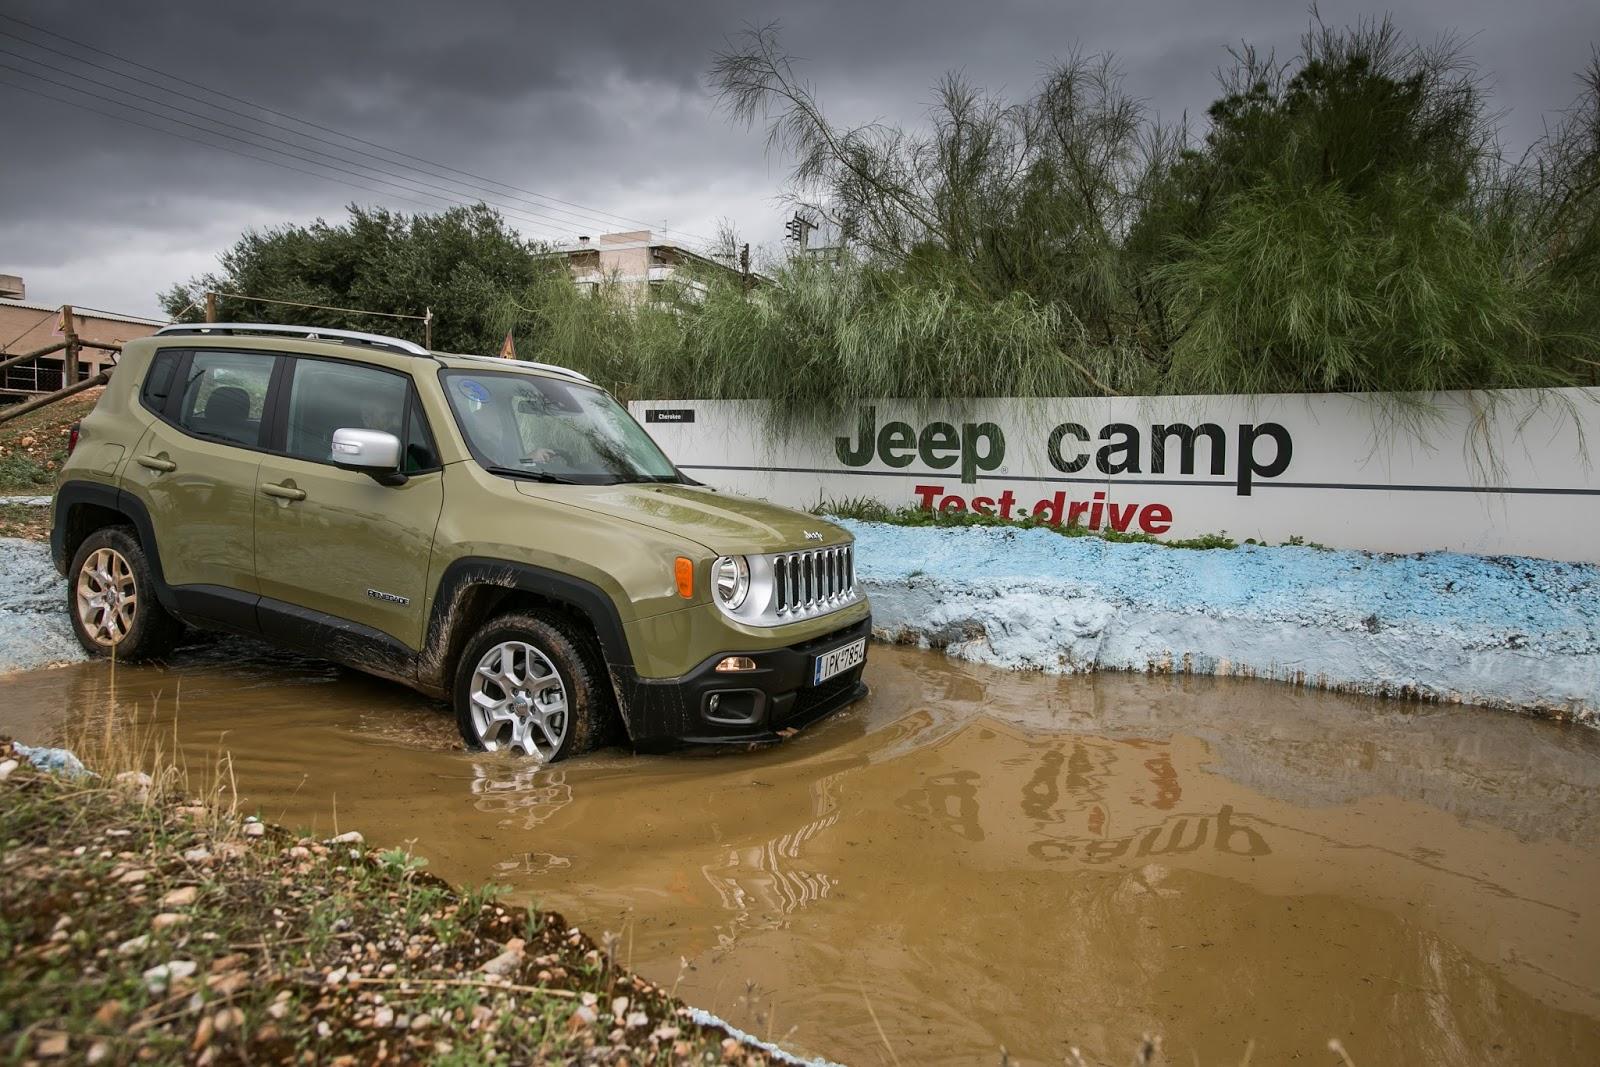 JEEP%2BCAMP GK 0446 Πετάμε ένα Jeep Renegade σε λάσπες, πέτρες, άμμο, λίμνες. Θα τα καταφέρει; Jeep, Jeep Renegade, Renegade, SUV, TEST, zblog, ΔΟΚΙΜΕΣ